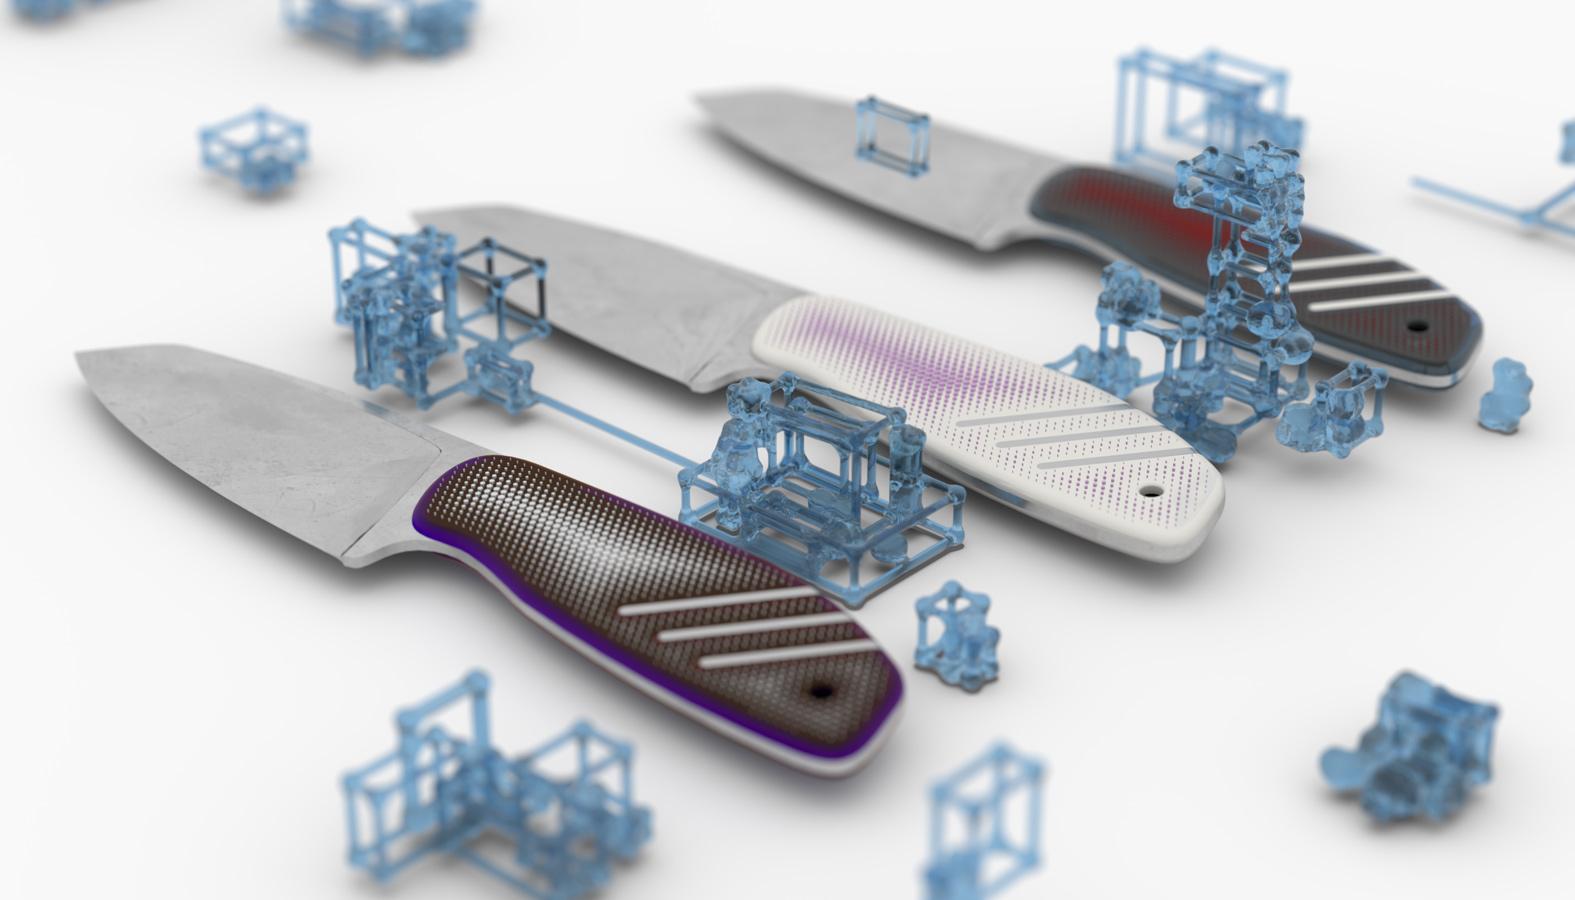 Uniblade-Knife-IMG_01.jpg